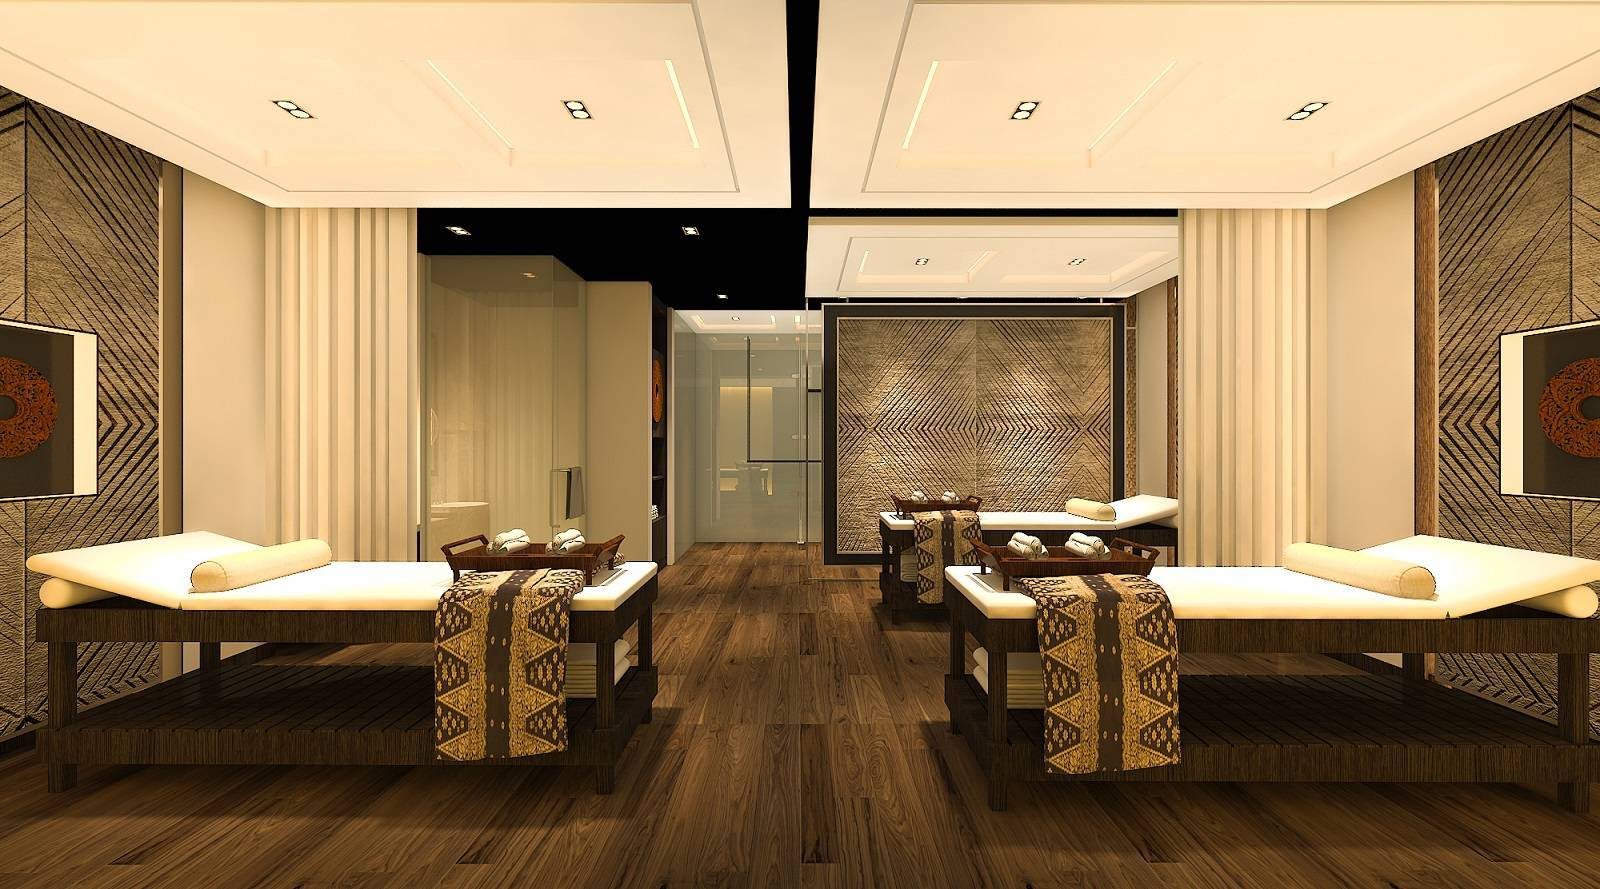 Pt. Daa Interplan Indonesia Spa At V Hotel Bandung, Indonesia Bandung, Indonesia Spa-Room-View-2 Kontemporer  7132